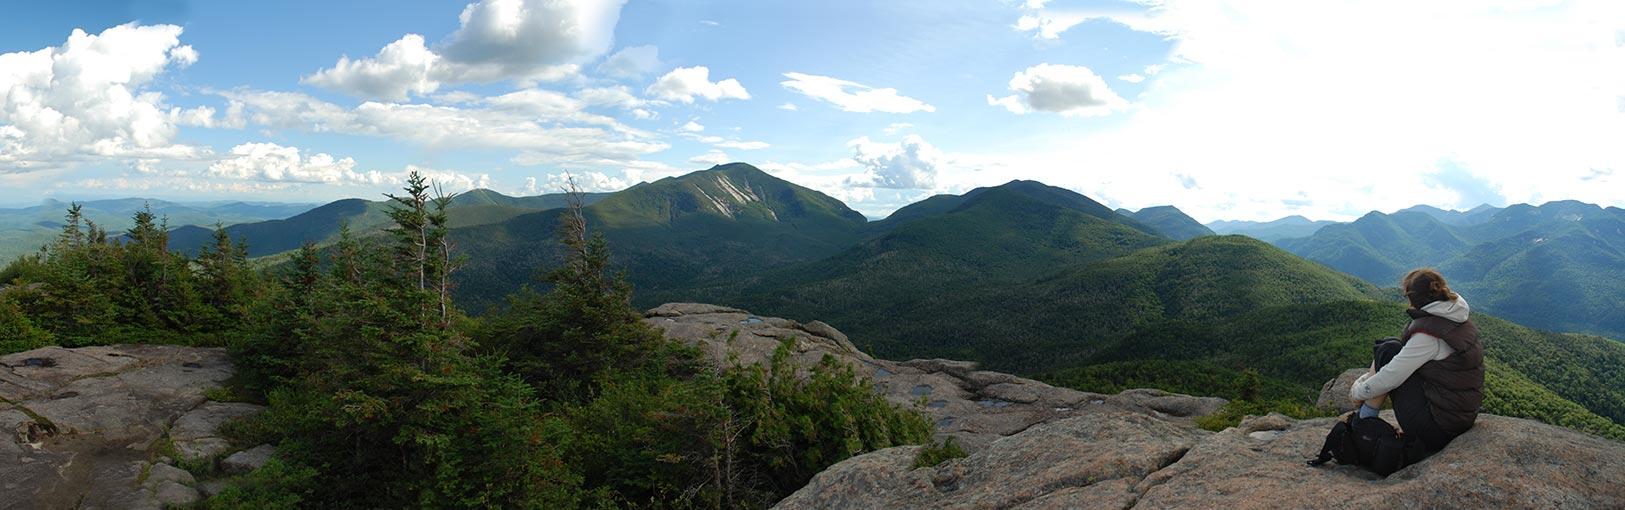 Sitting on mountain top after hiking local Adirondack High Peak